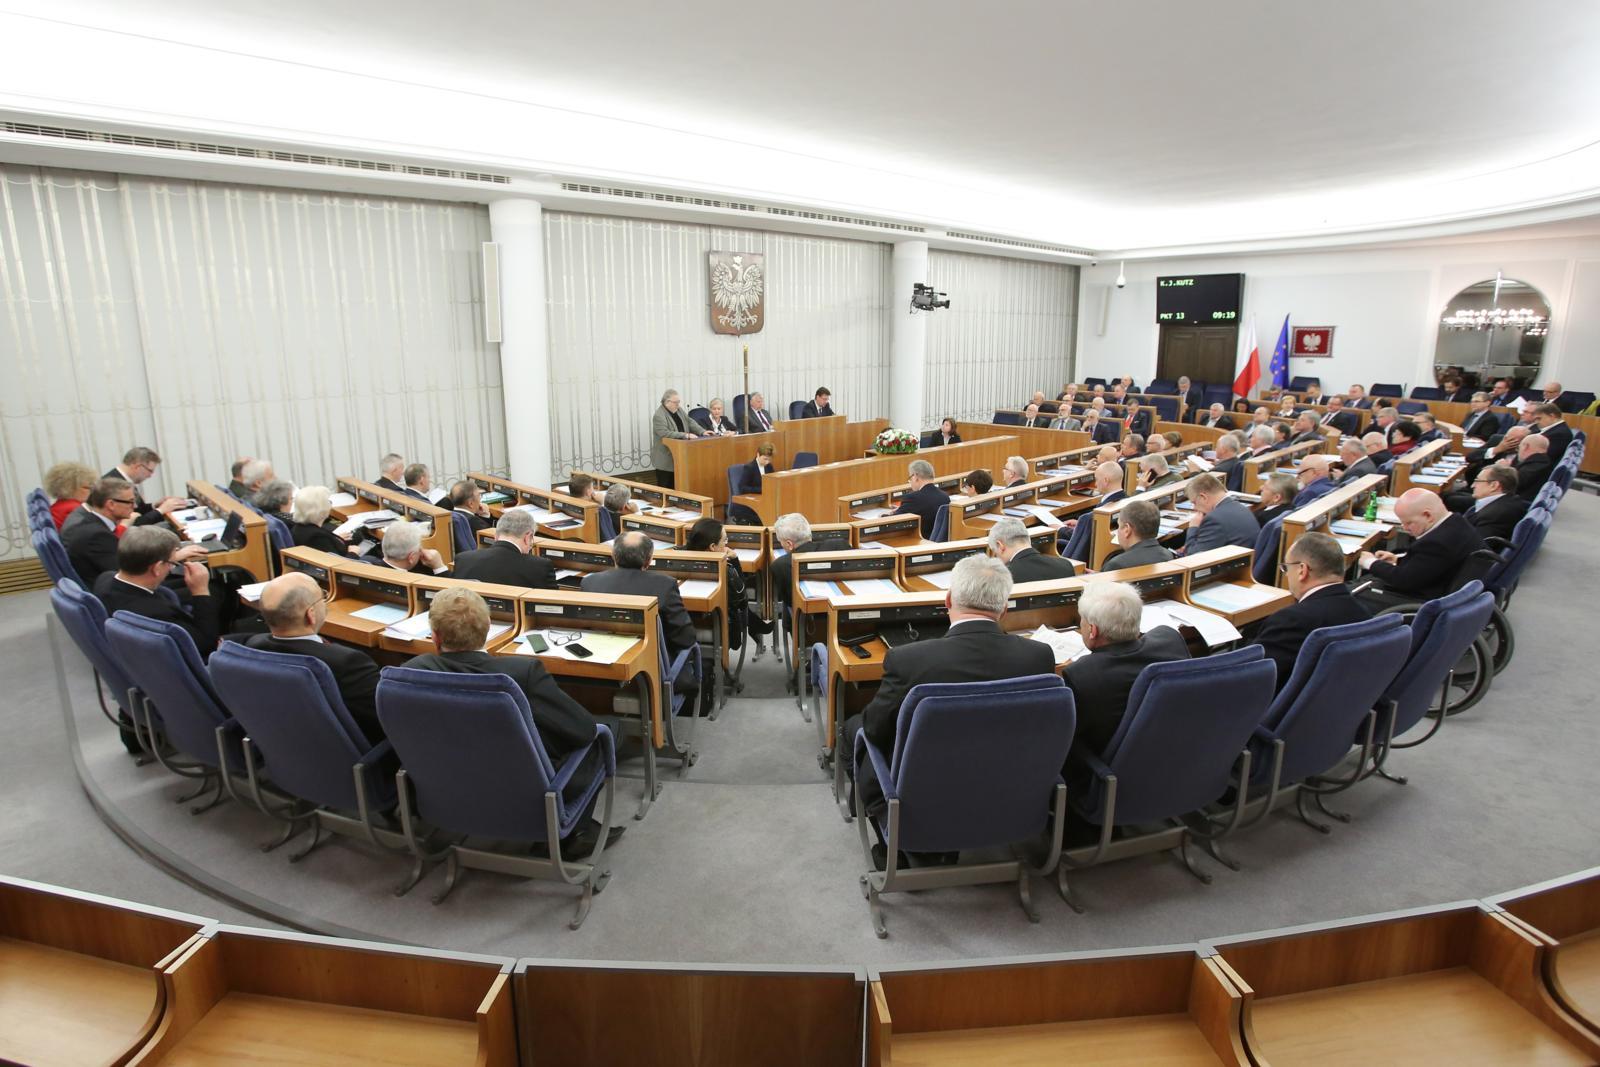 Senat Fot. Michał Józefaciuk  Kancelaria Senatu